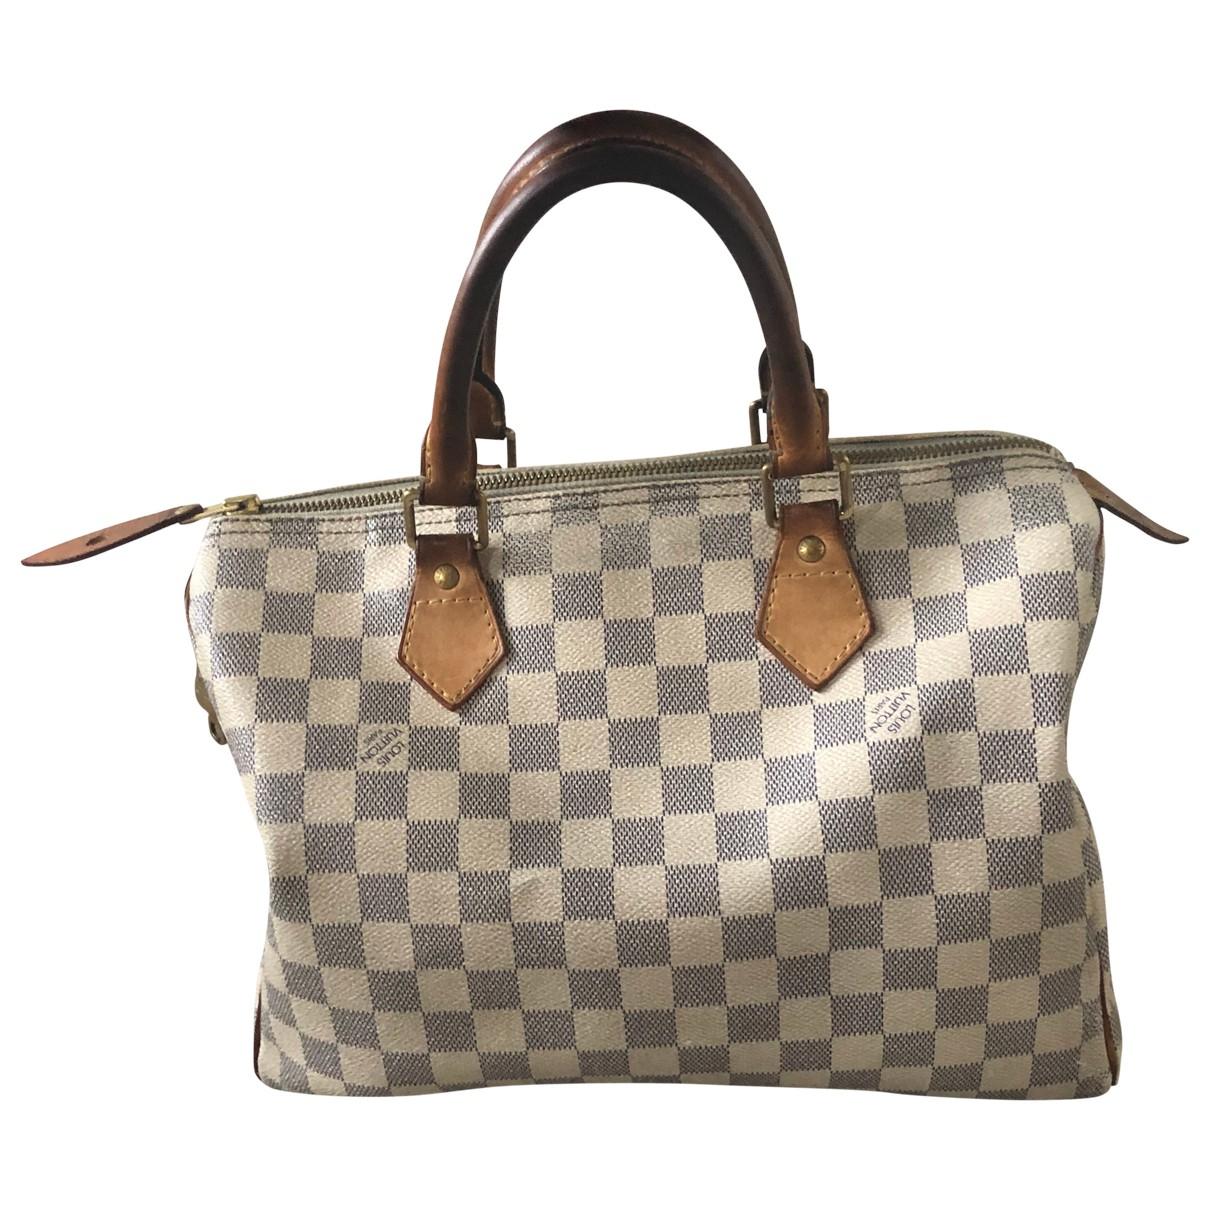 Louis Vuitton Speedy Ecru Cloth handbag for Women N